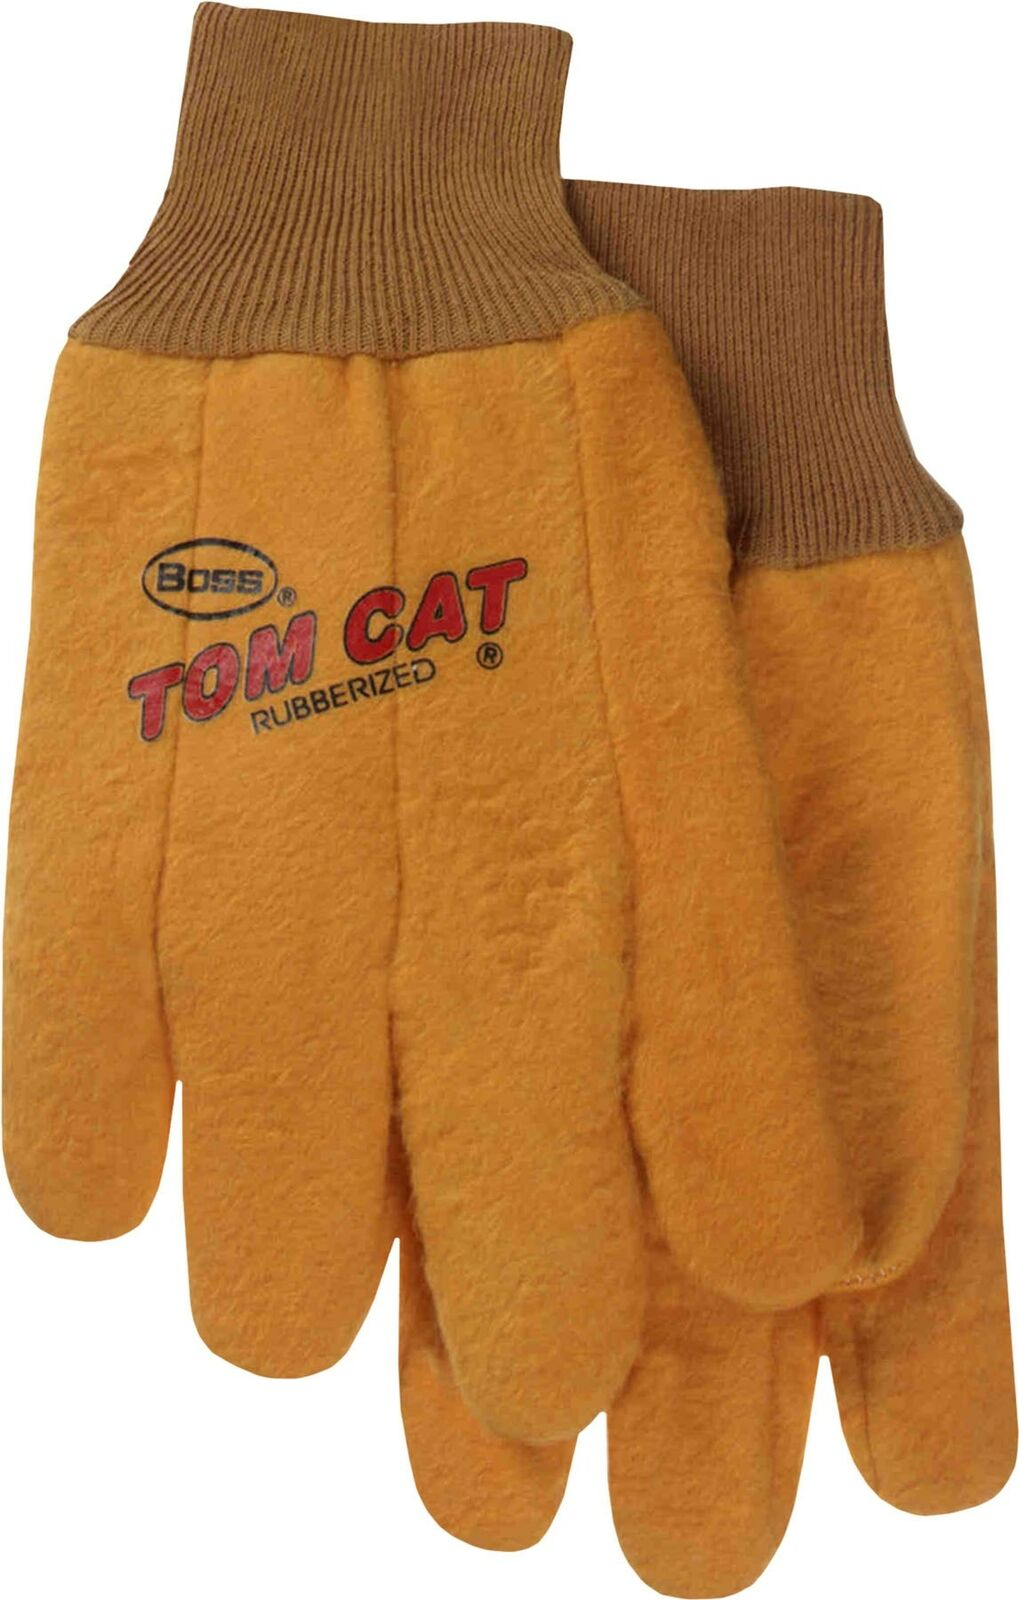 Boss Gloves 341B Tom Cat Yellow Women's General Purpose Gloves Small